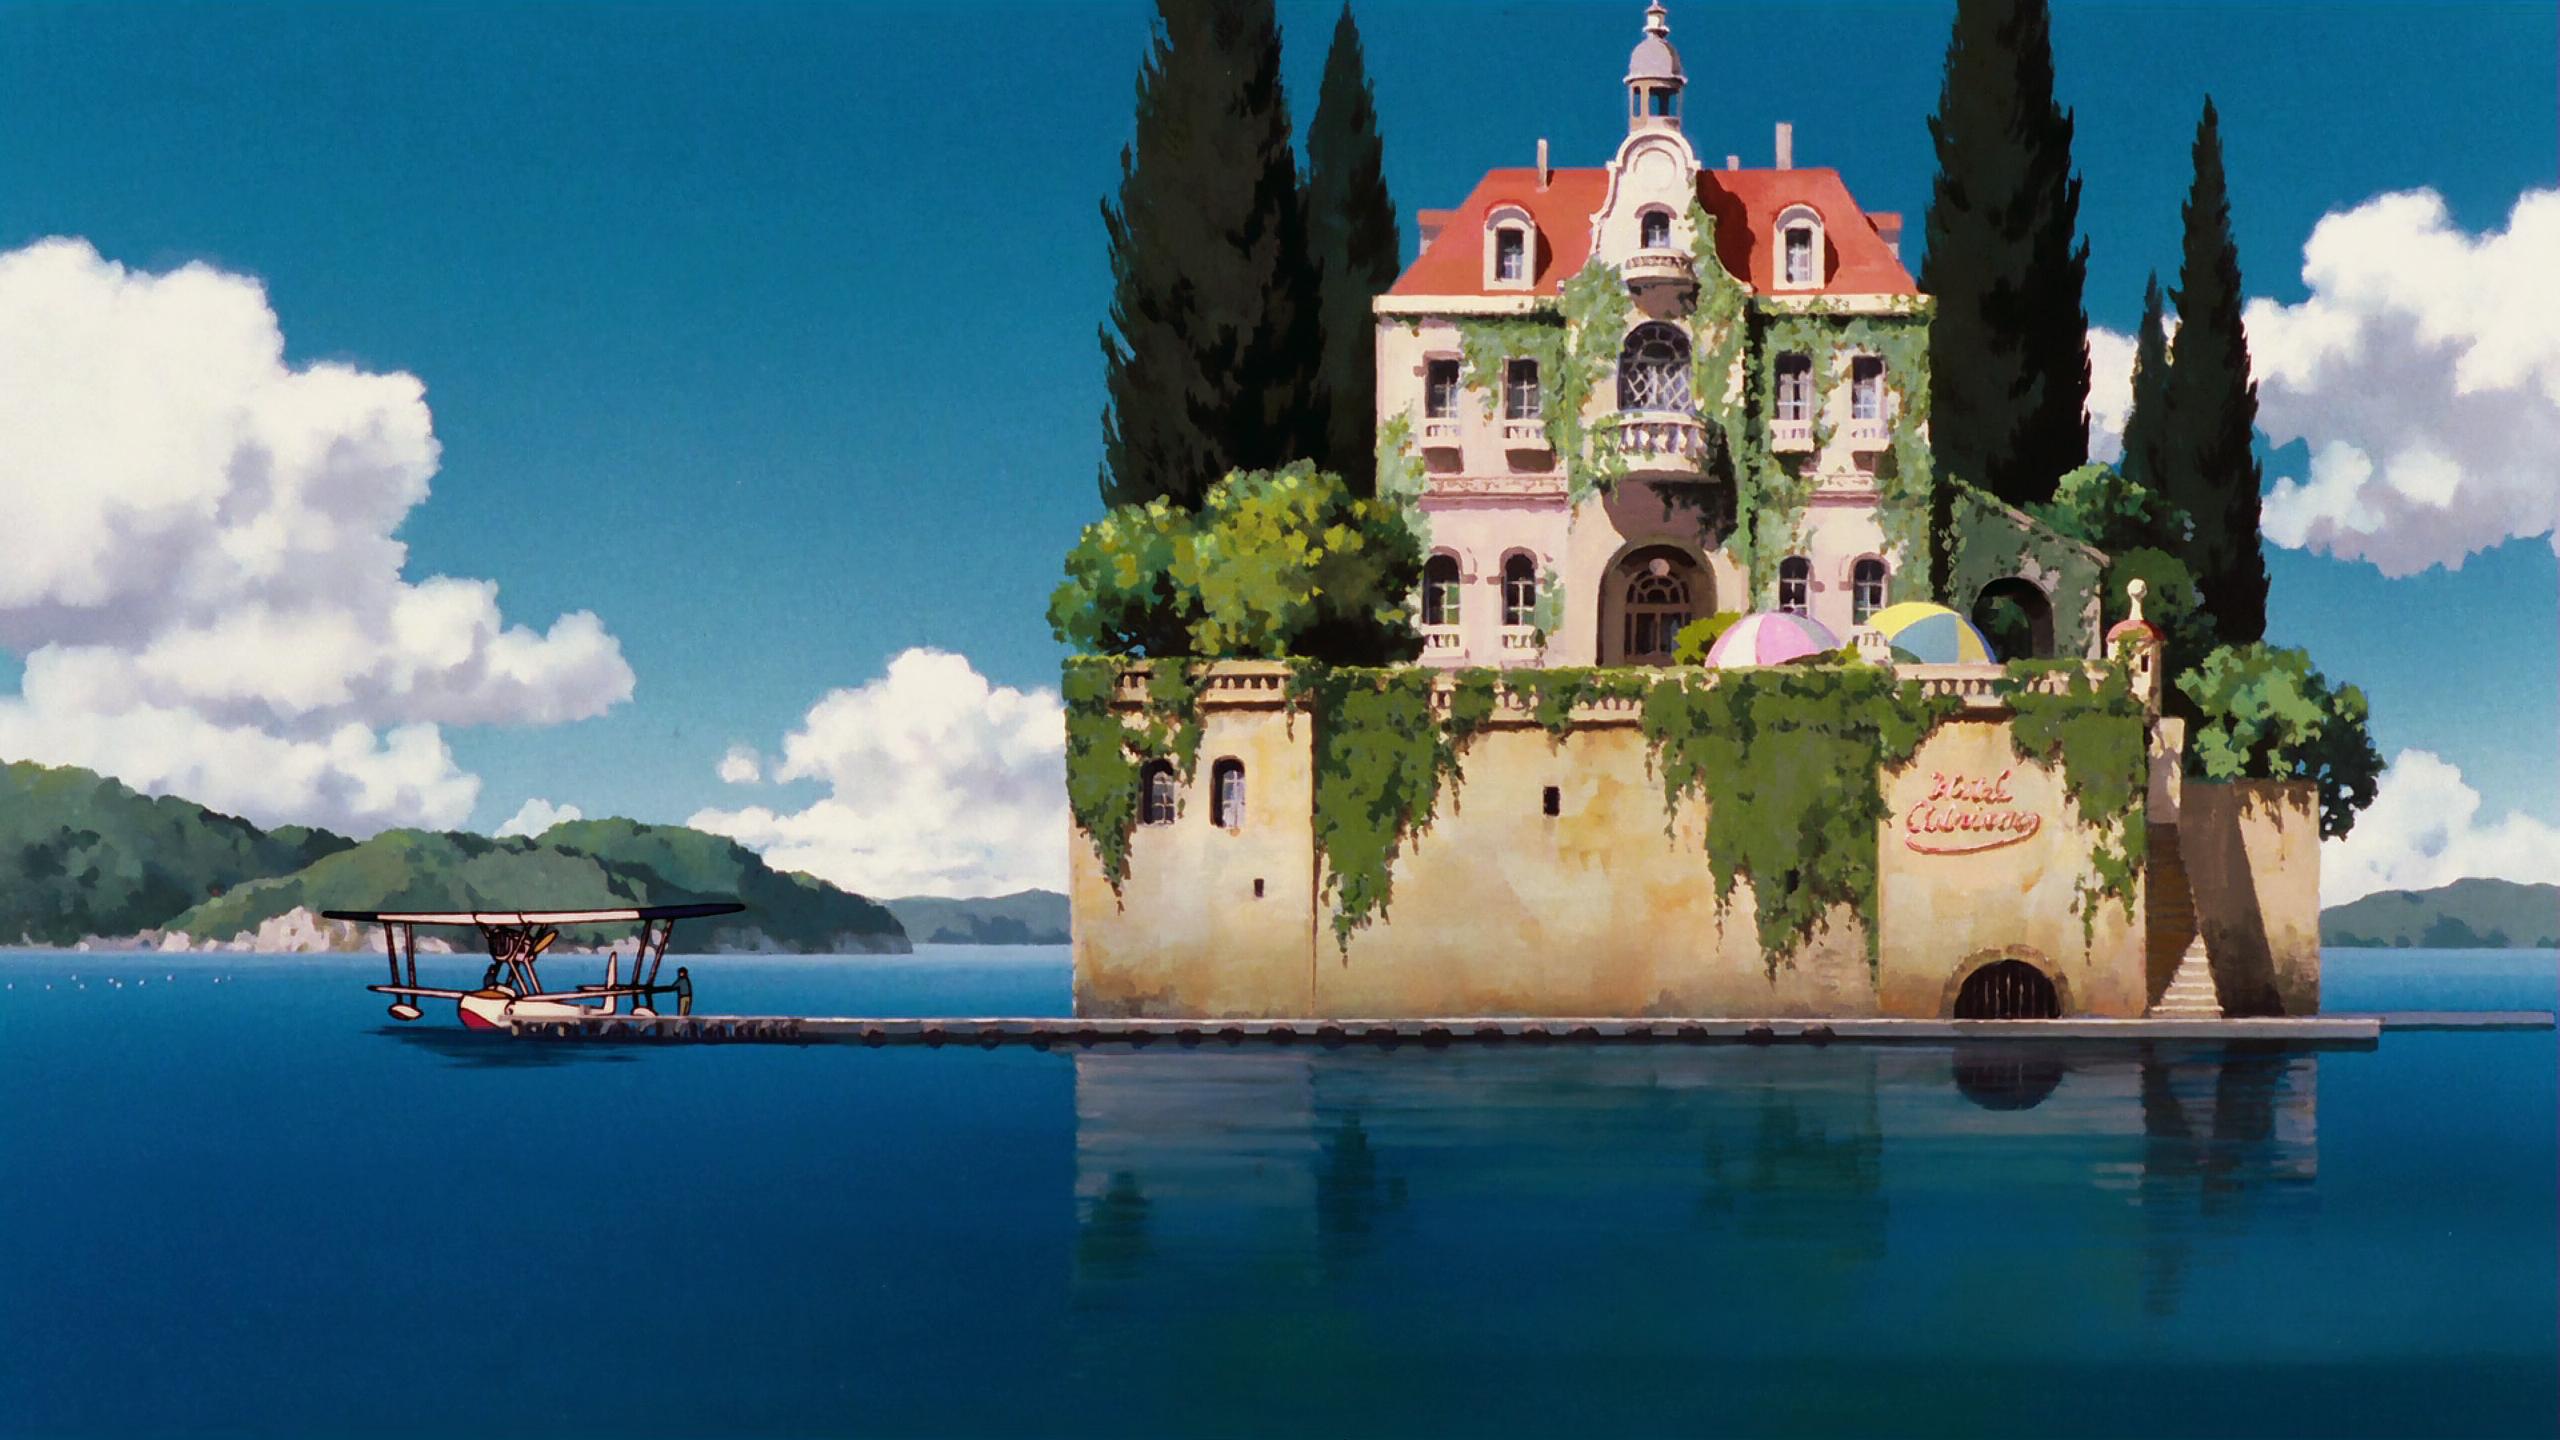 100 Studio Ghibli wallpapers Imgur Environments